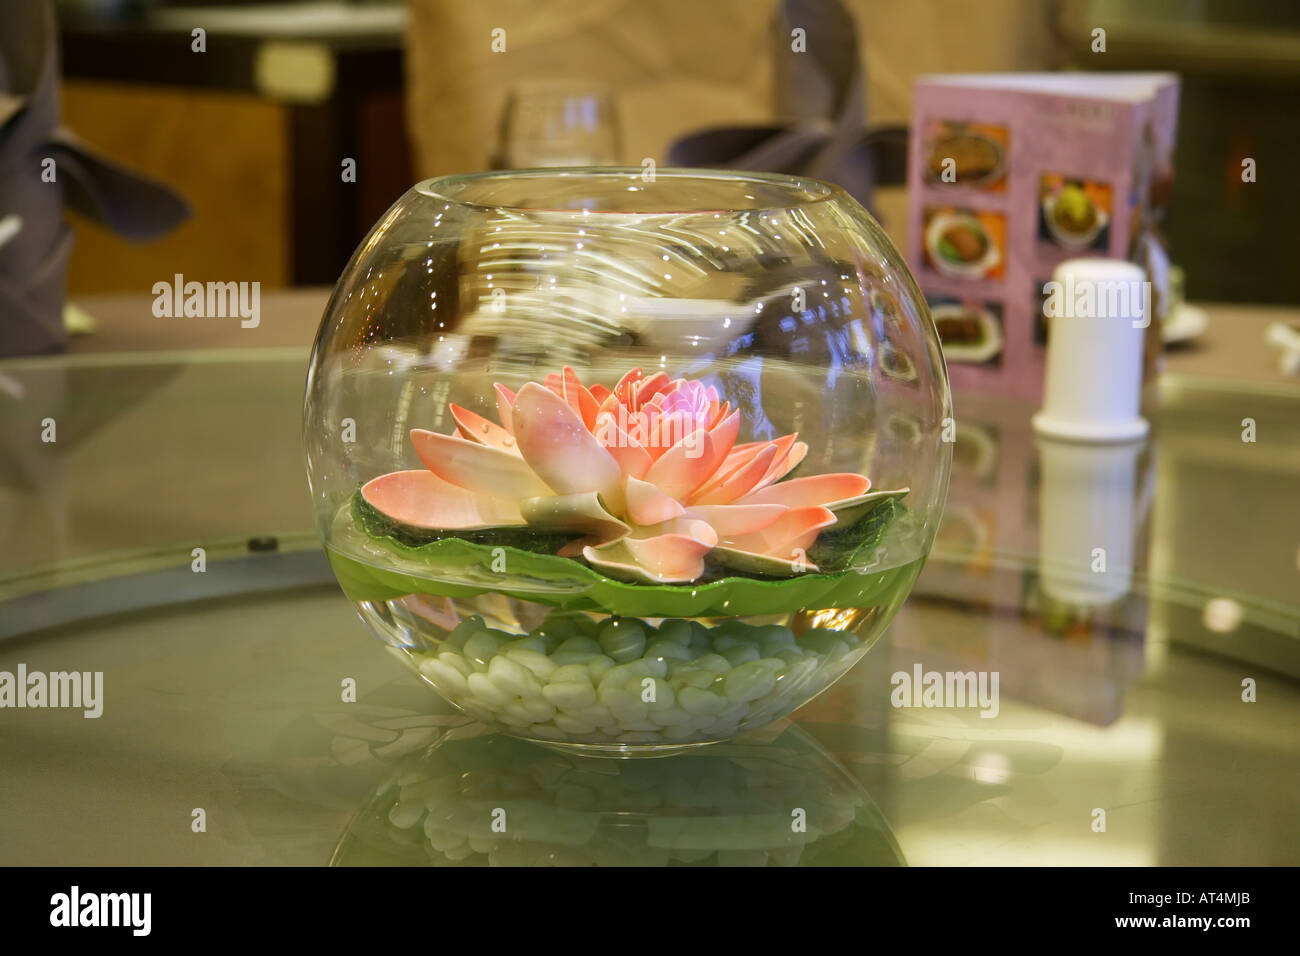 Lotus Flower Center Piece At The Taishengyuan Restaurant Pudong